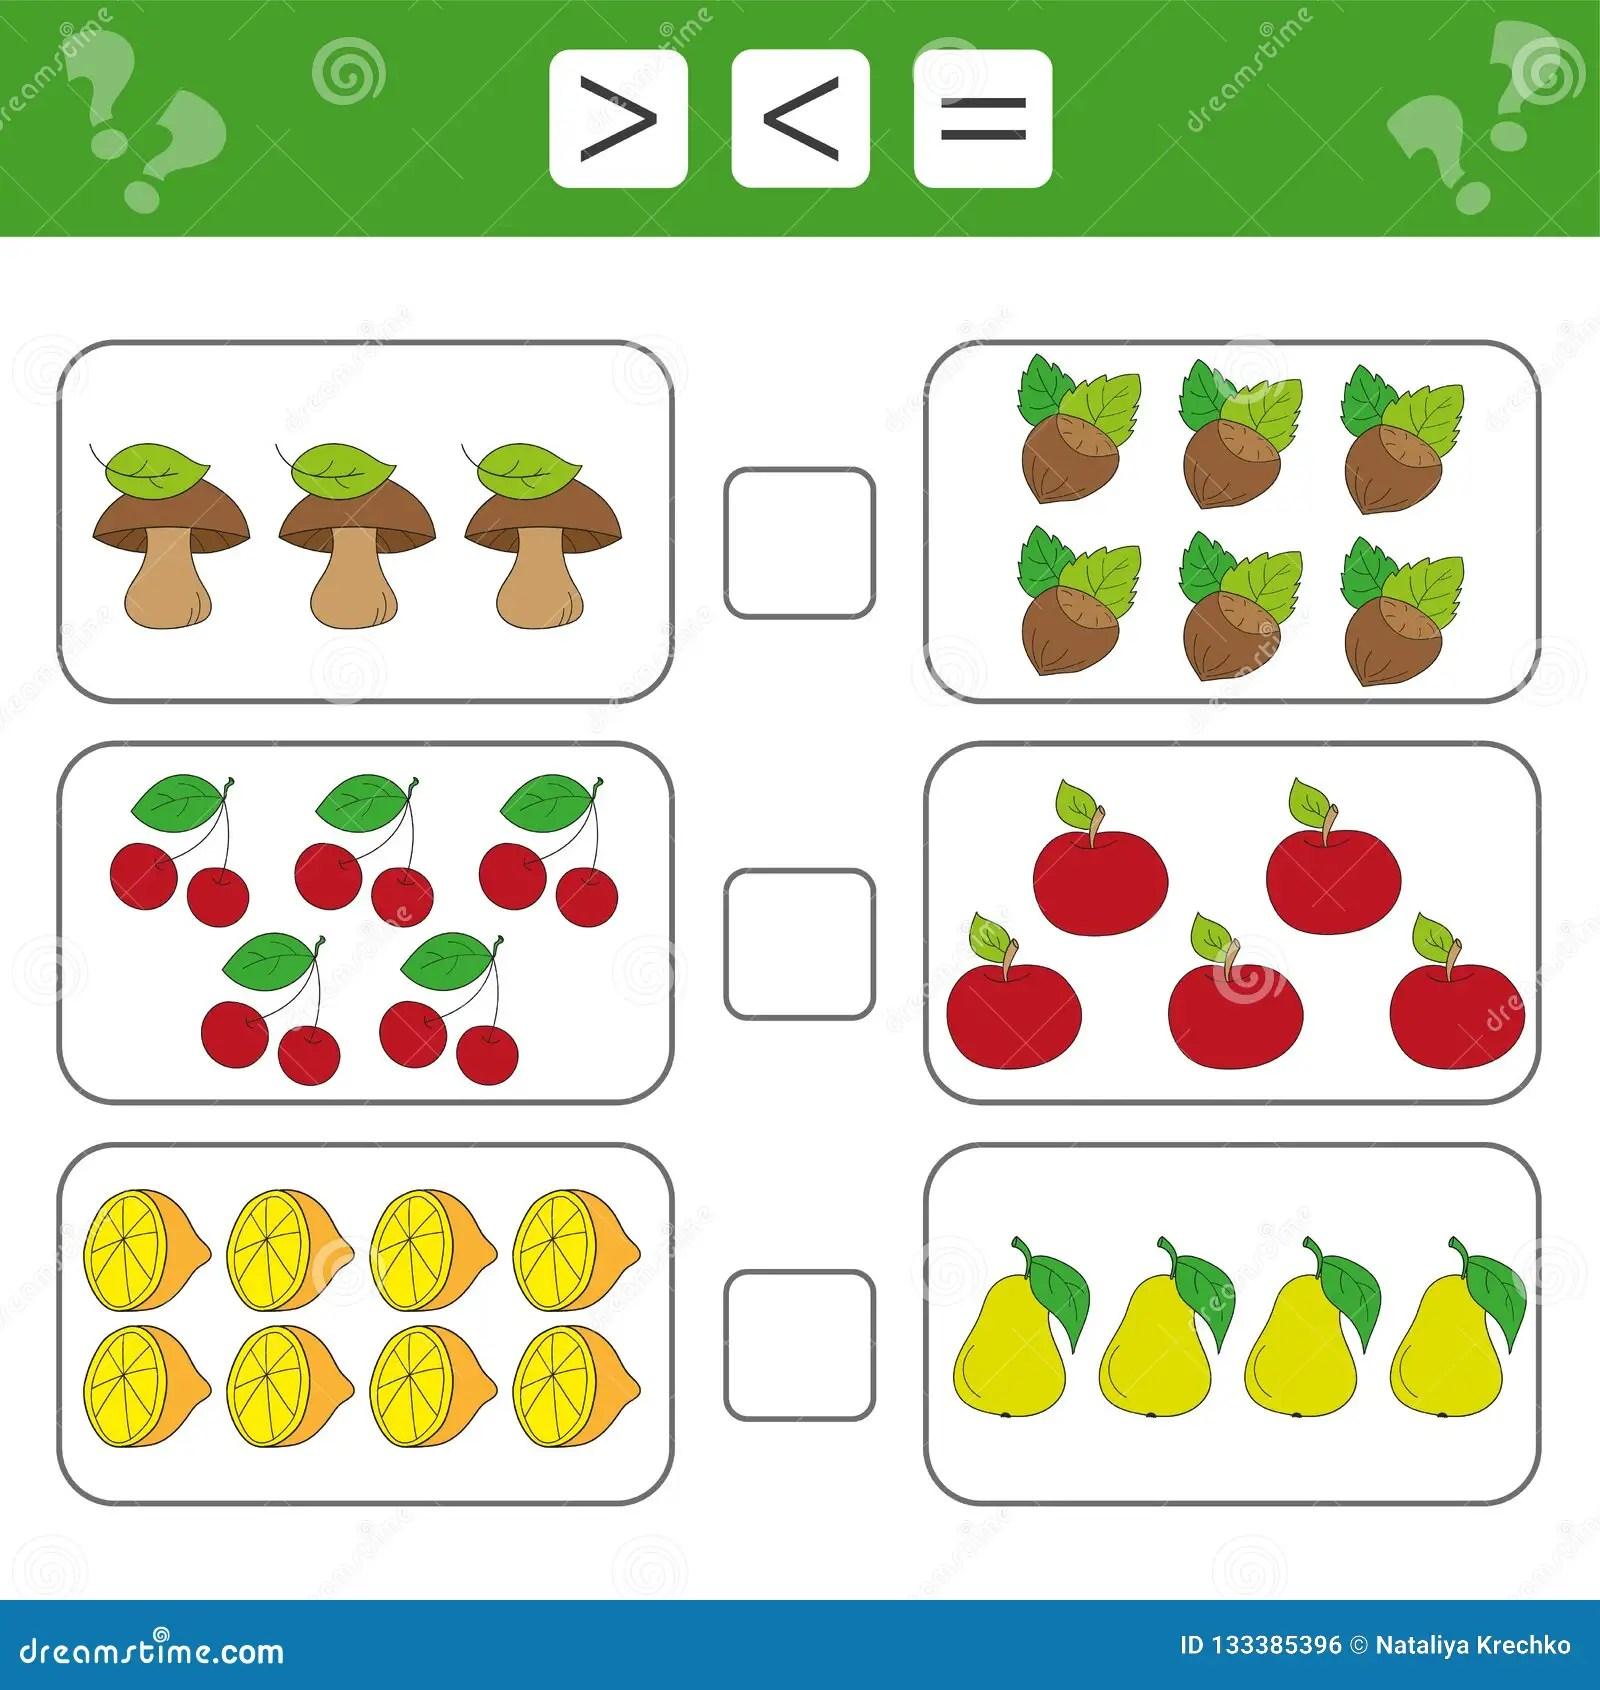 Mathematics Worksheet For Kids Count Educational Children